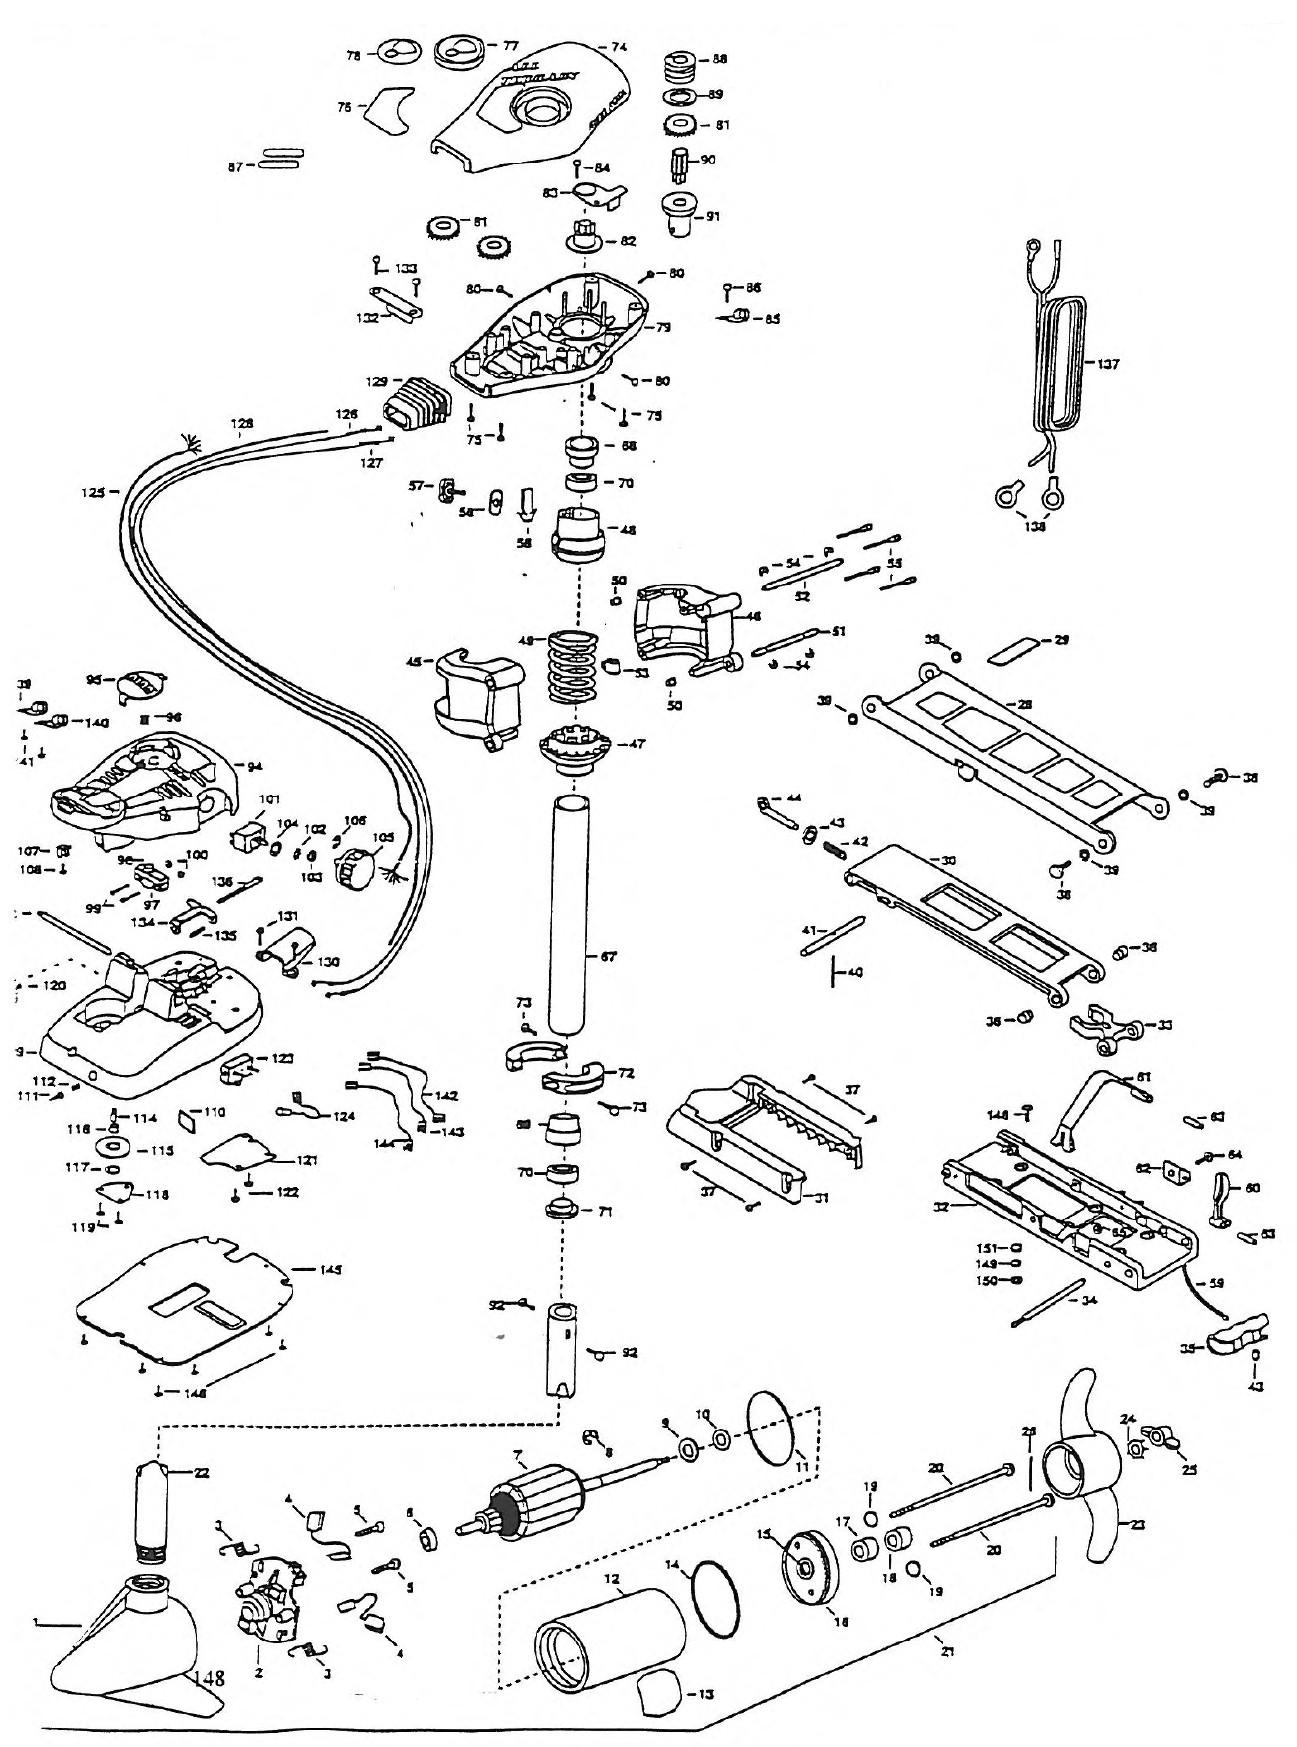 minn kota v manual endura c parts diagram schematics wiring data chrysler town and country